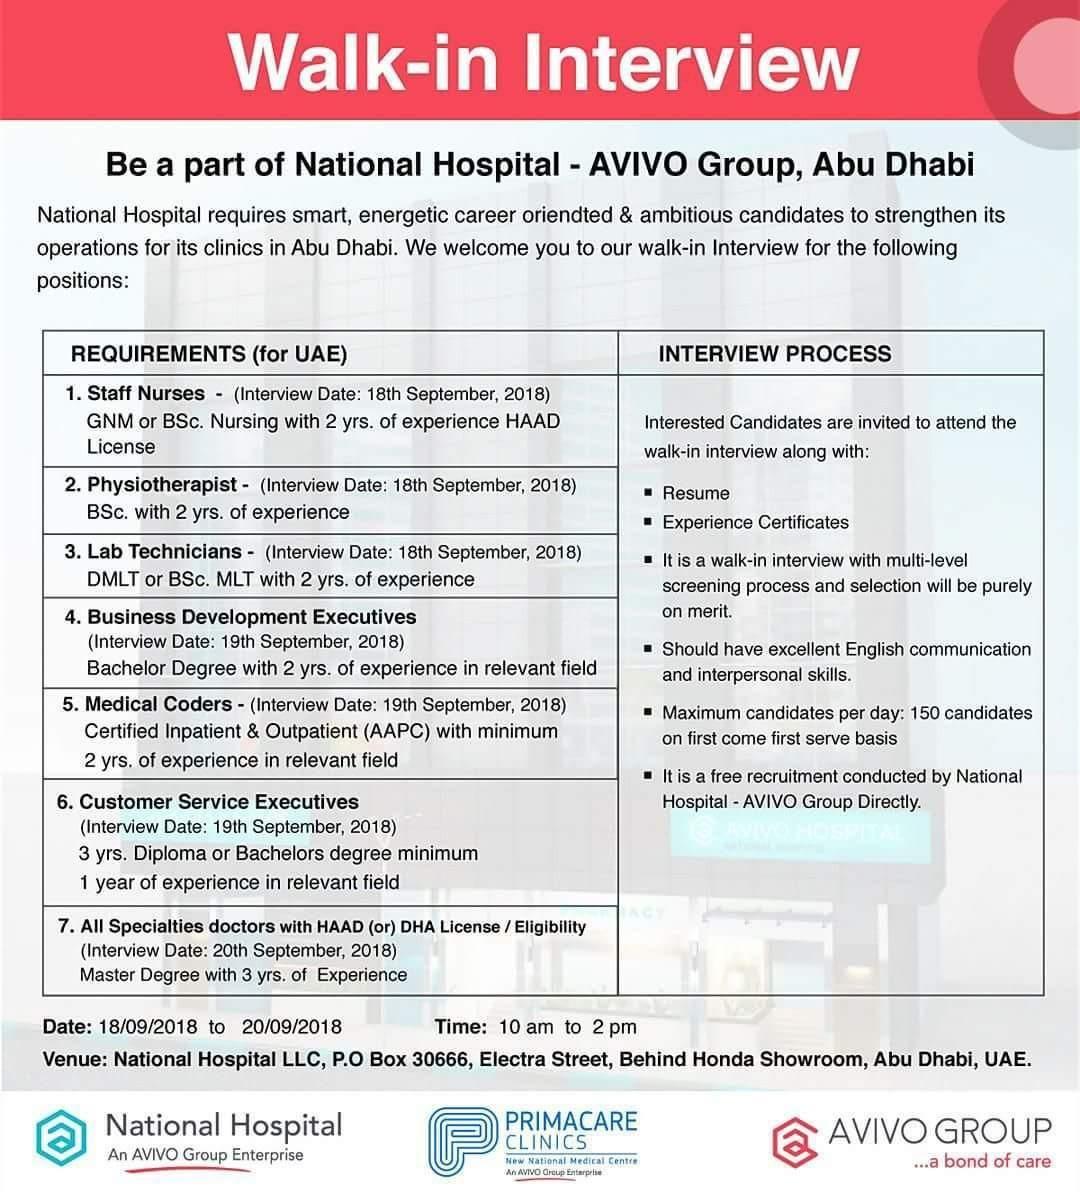 Walkin Interview UAE Job Openings Job opening, Interview